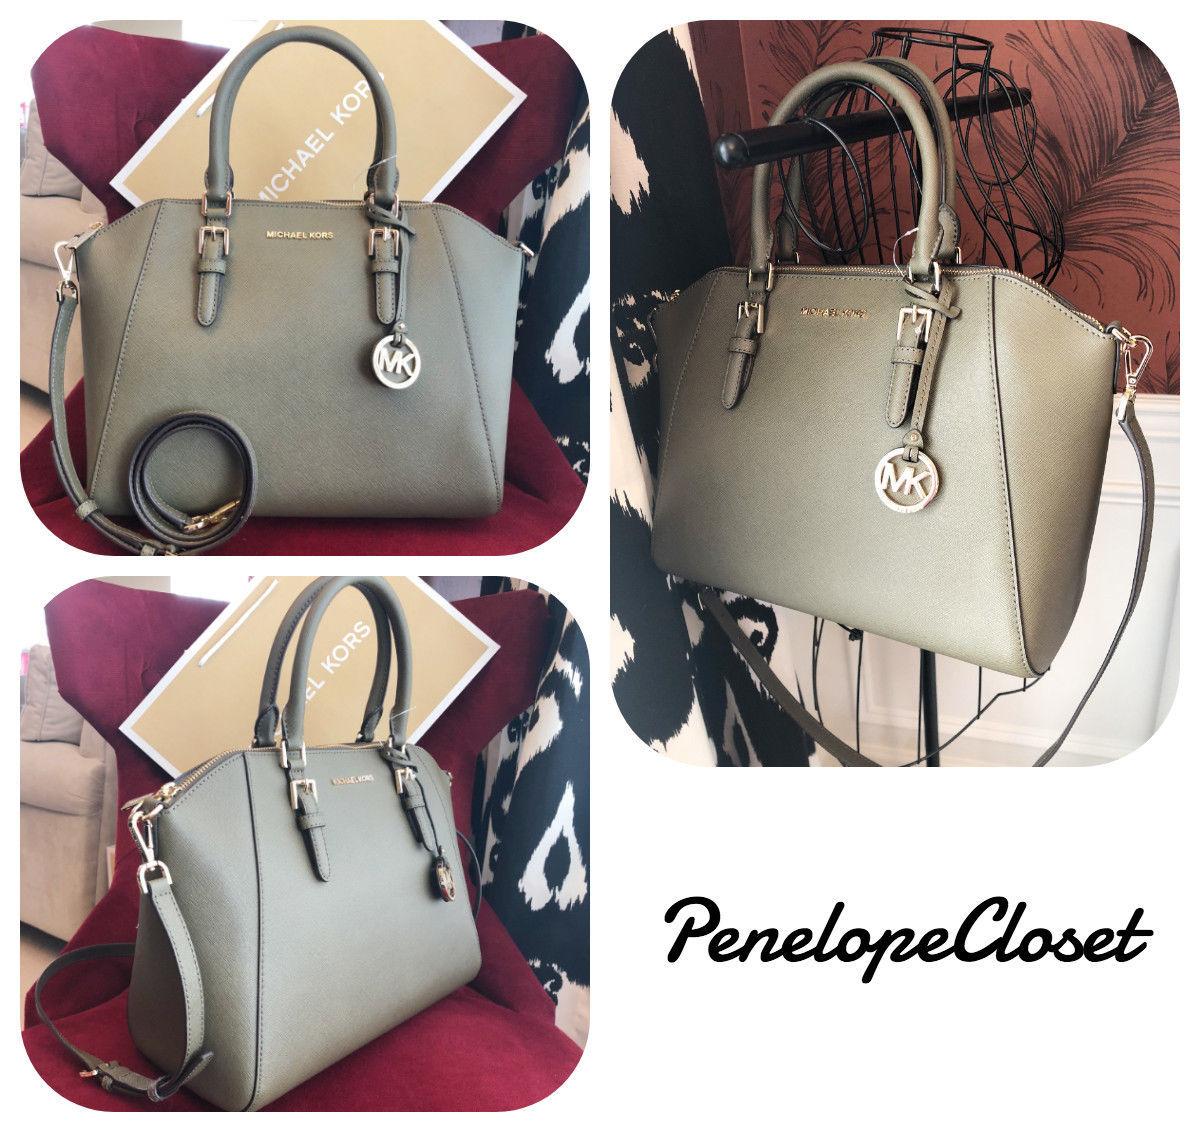 9715c23d3726 Nwt Michael Kors Saffiano Leather Ciara and 50 similar items. S l1600